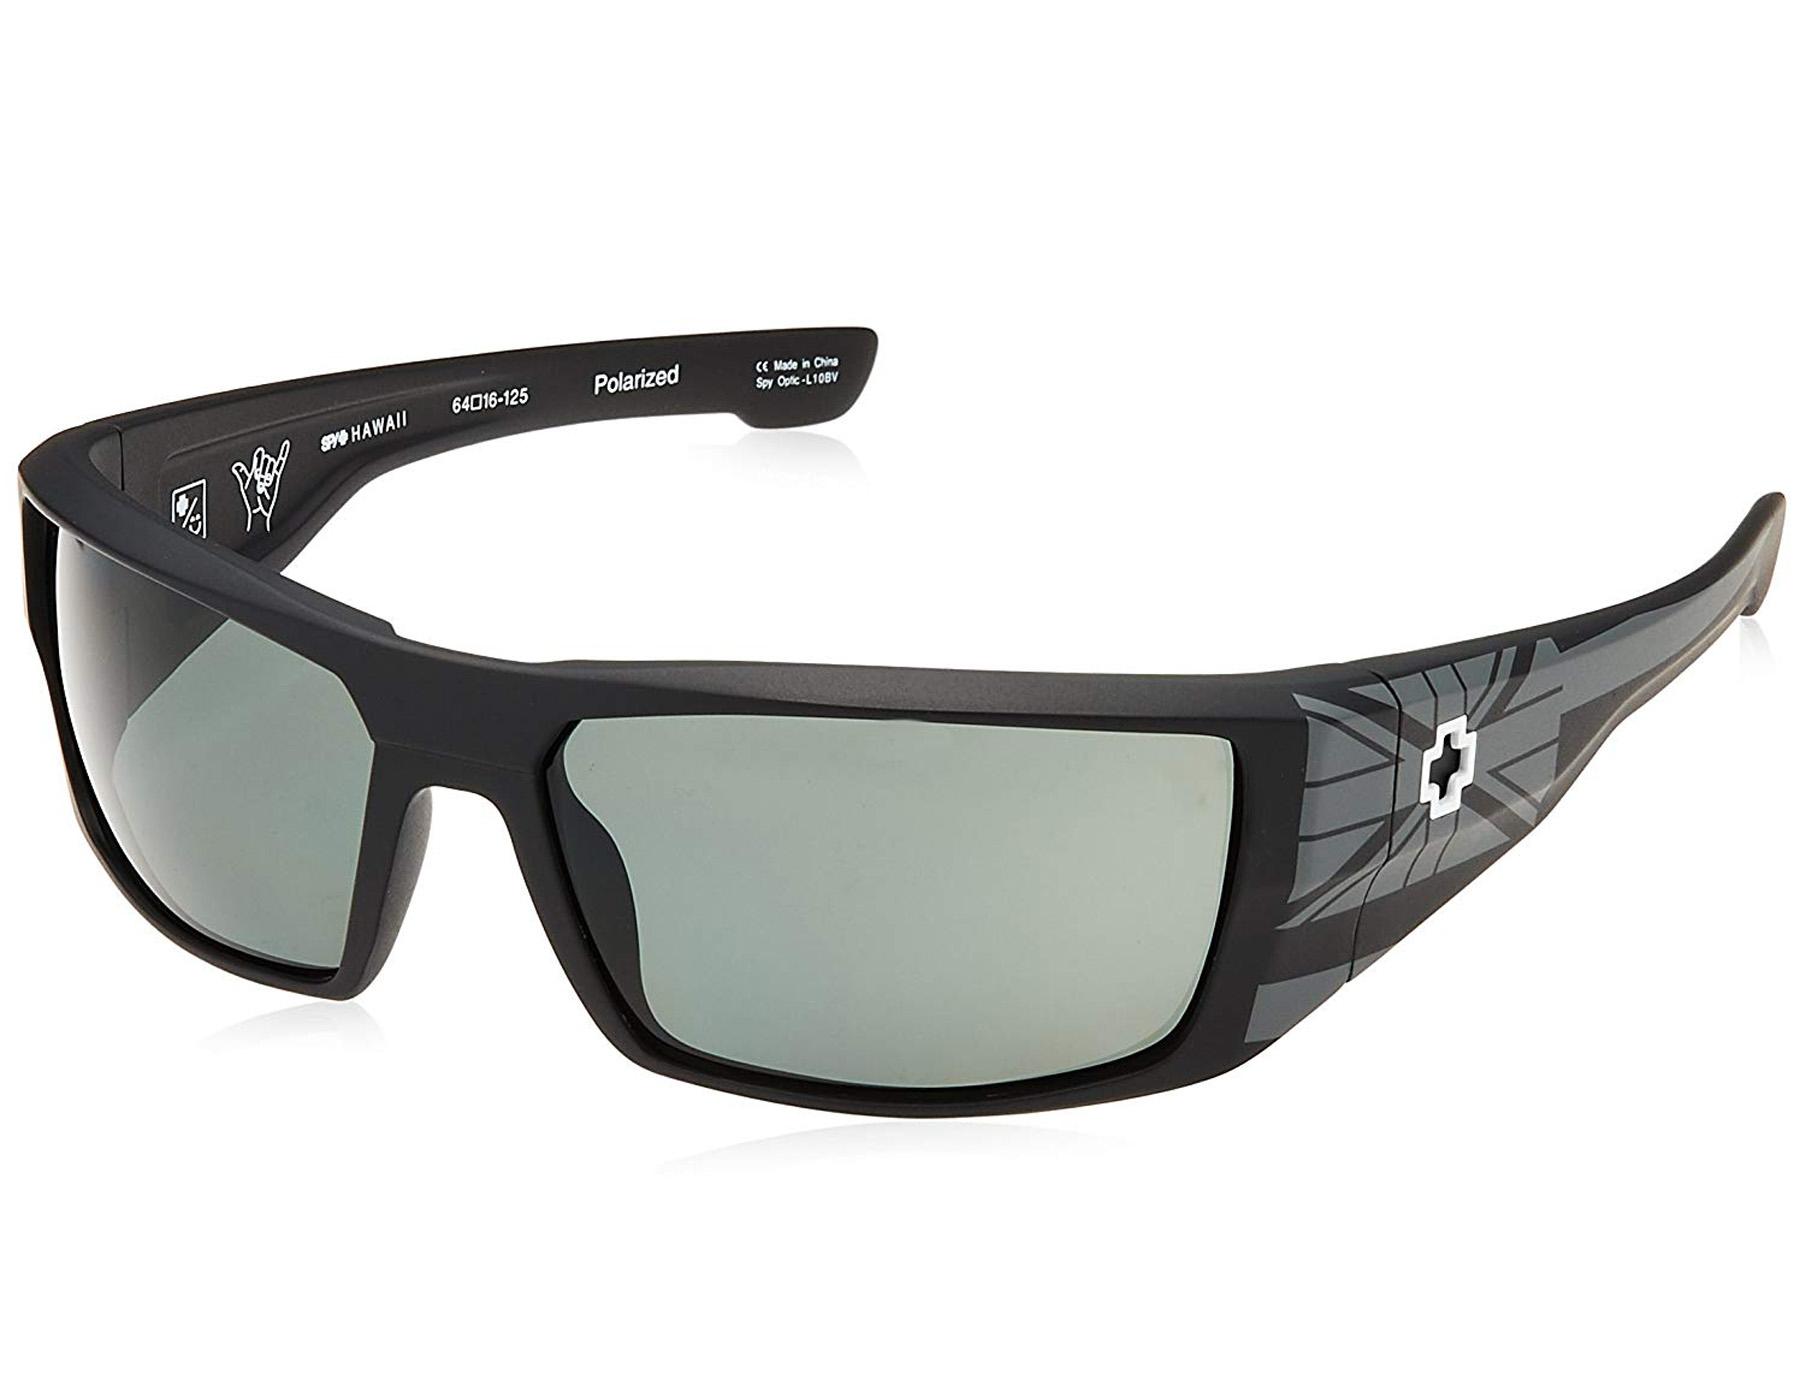 8f132172ebe75 Details about NEW Spy Optics Dirk Hawaii   Happy Grey Green Polarized  182052782864 Sunglasses